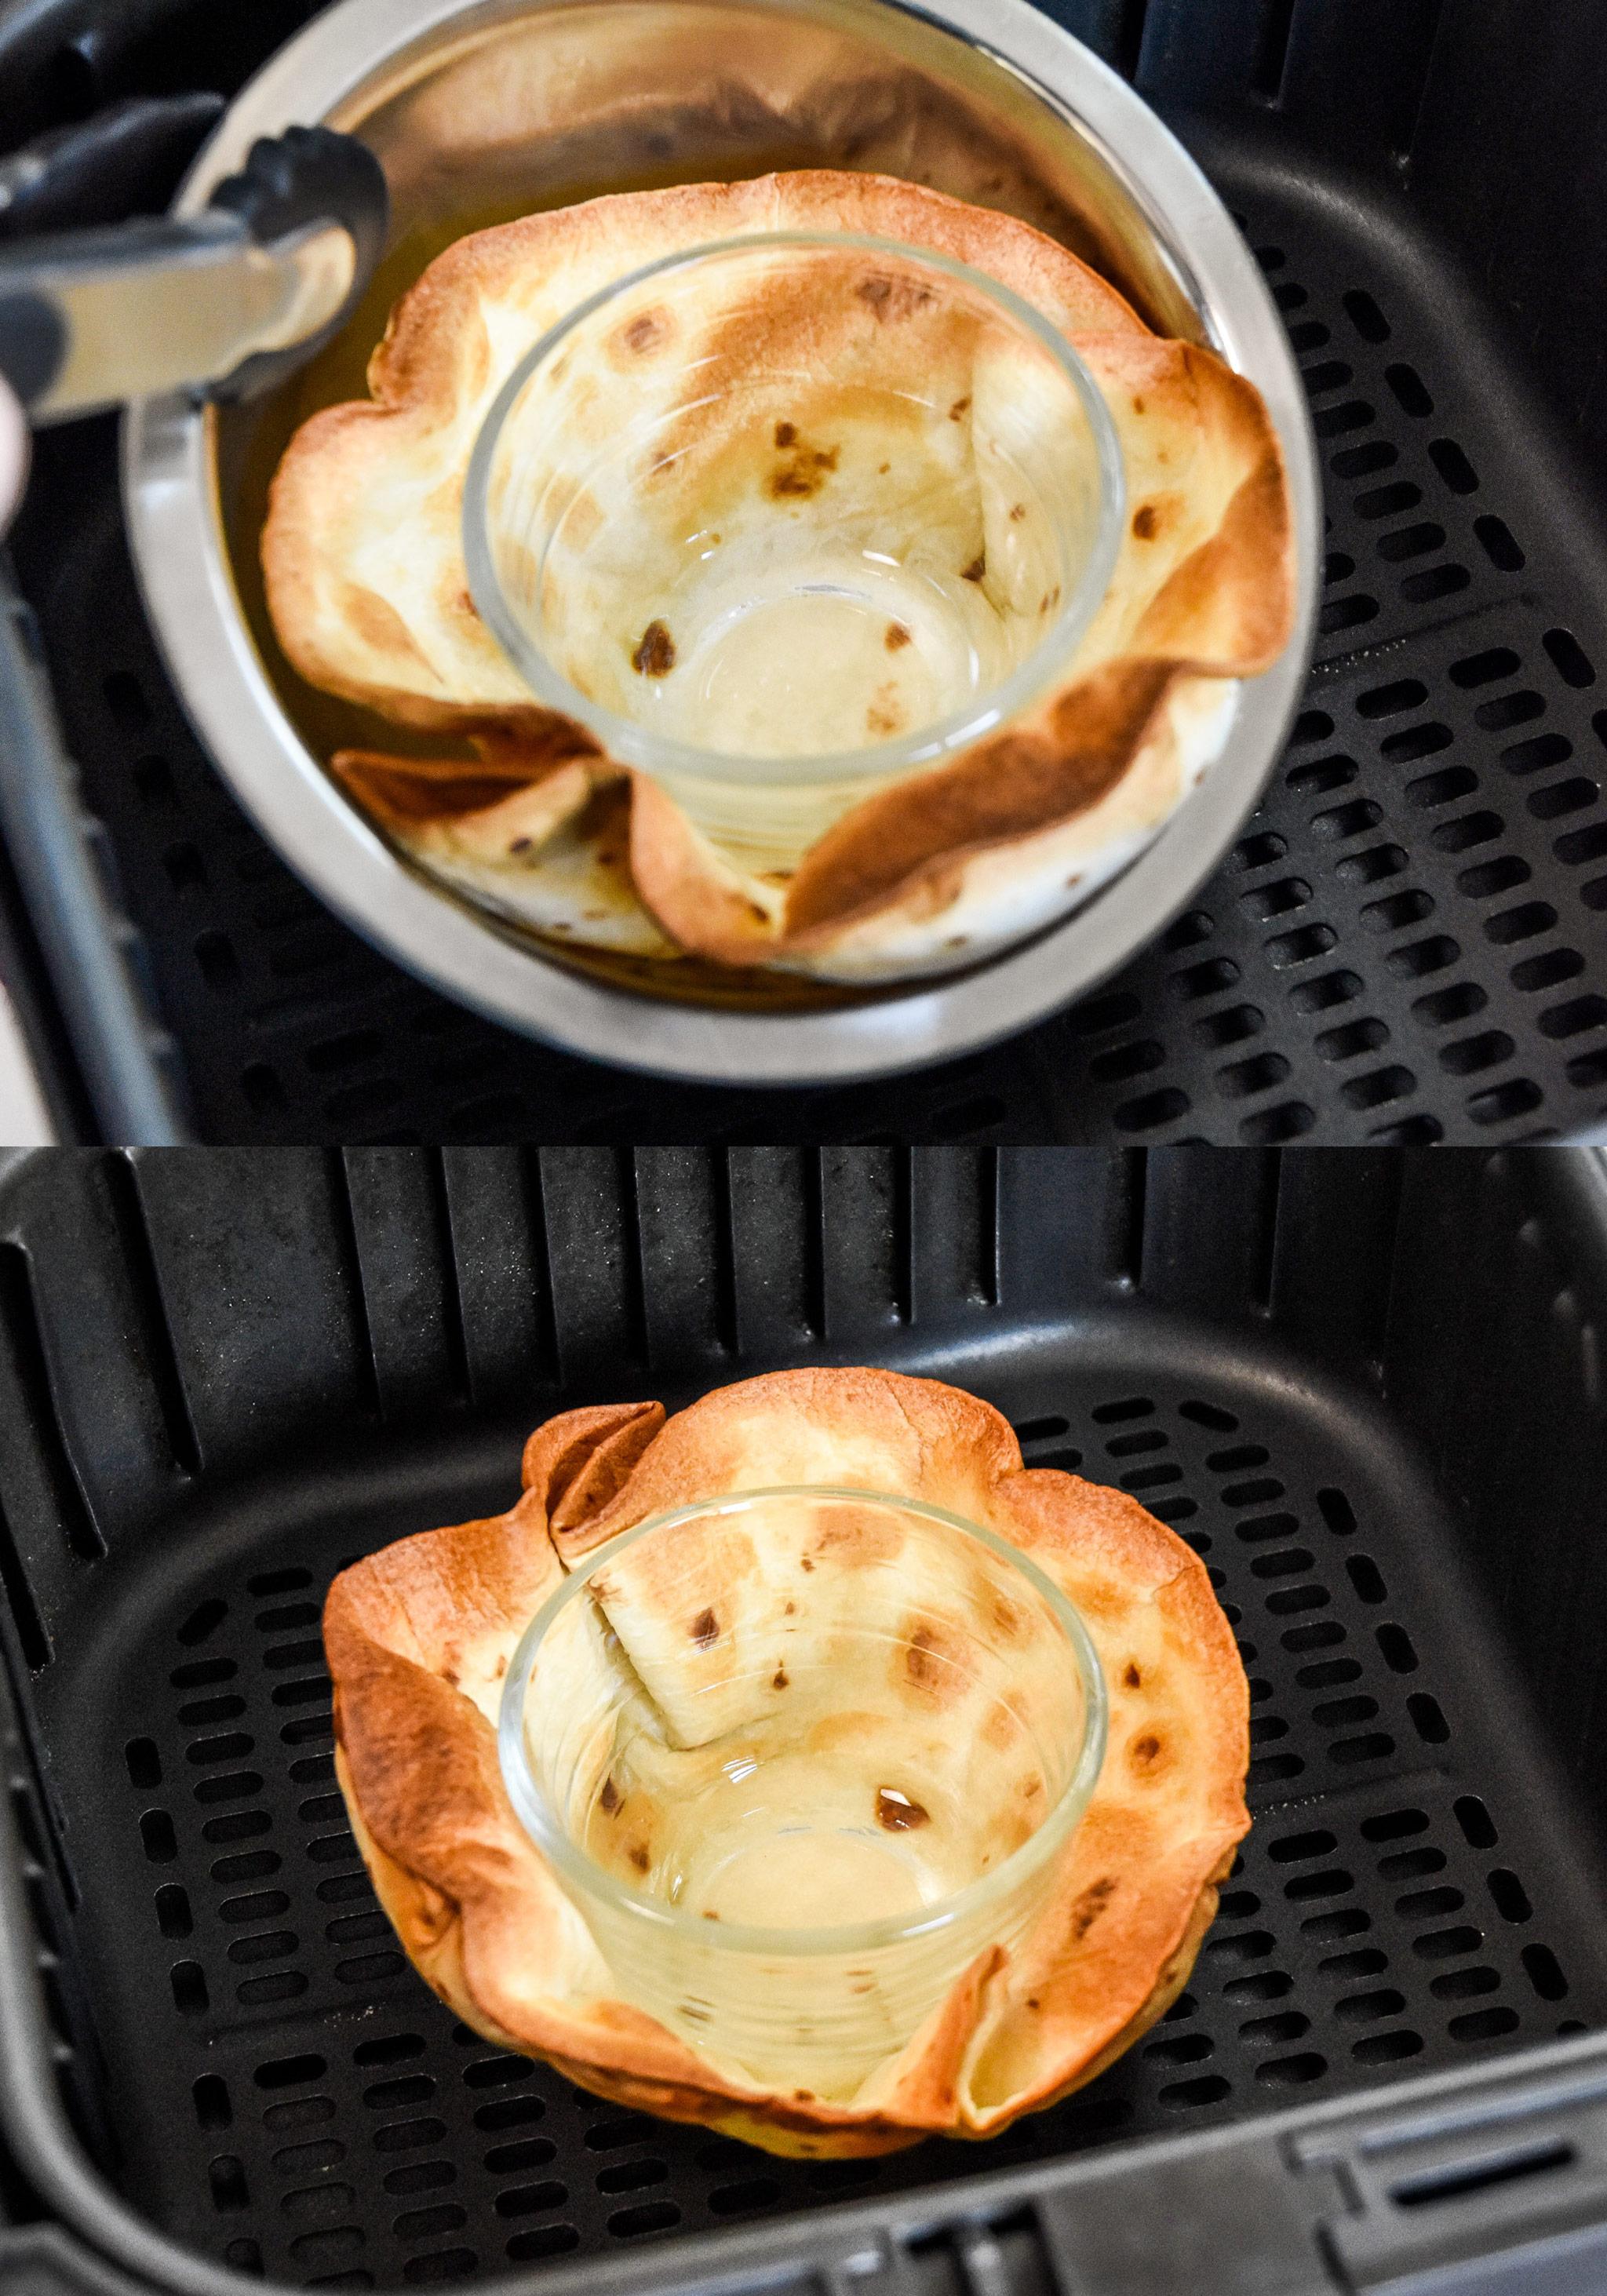 cooking a flour tortilla in an air fryer into a bowl shape